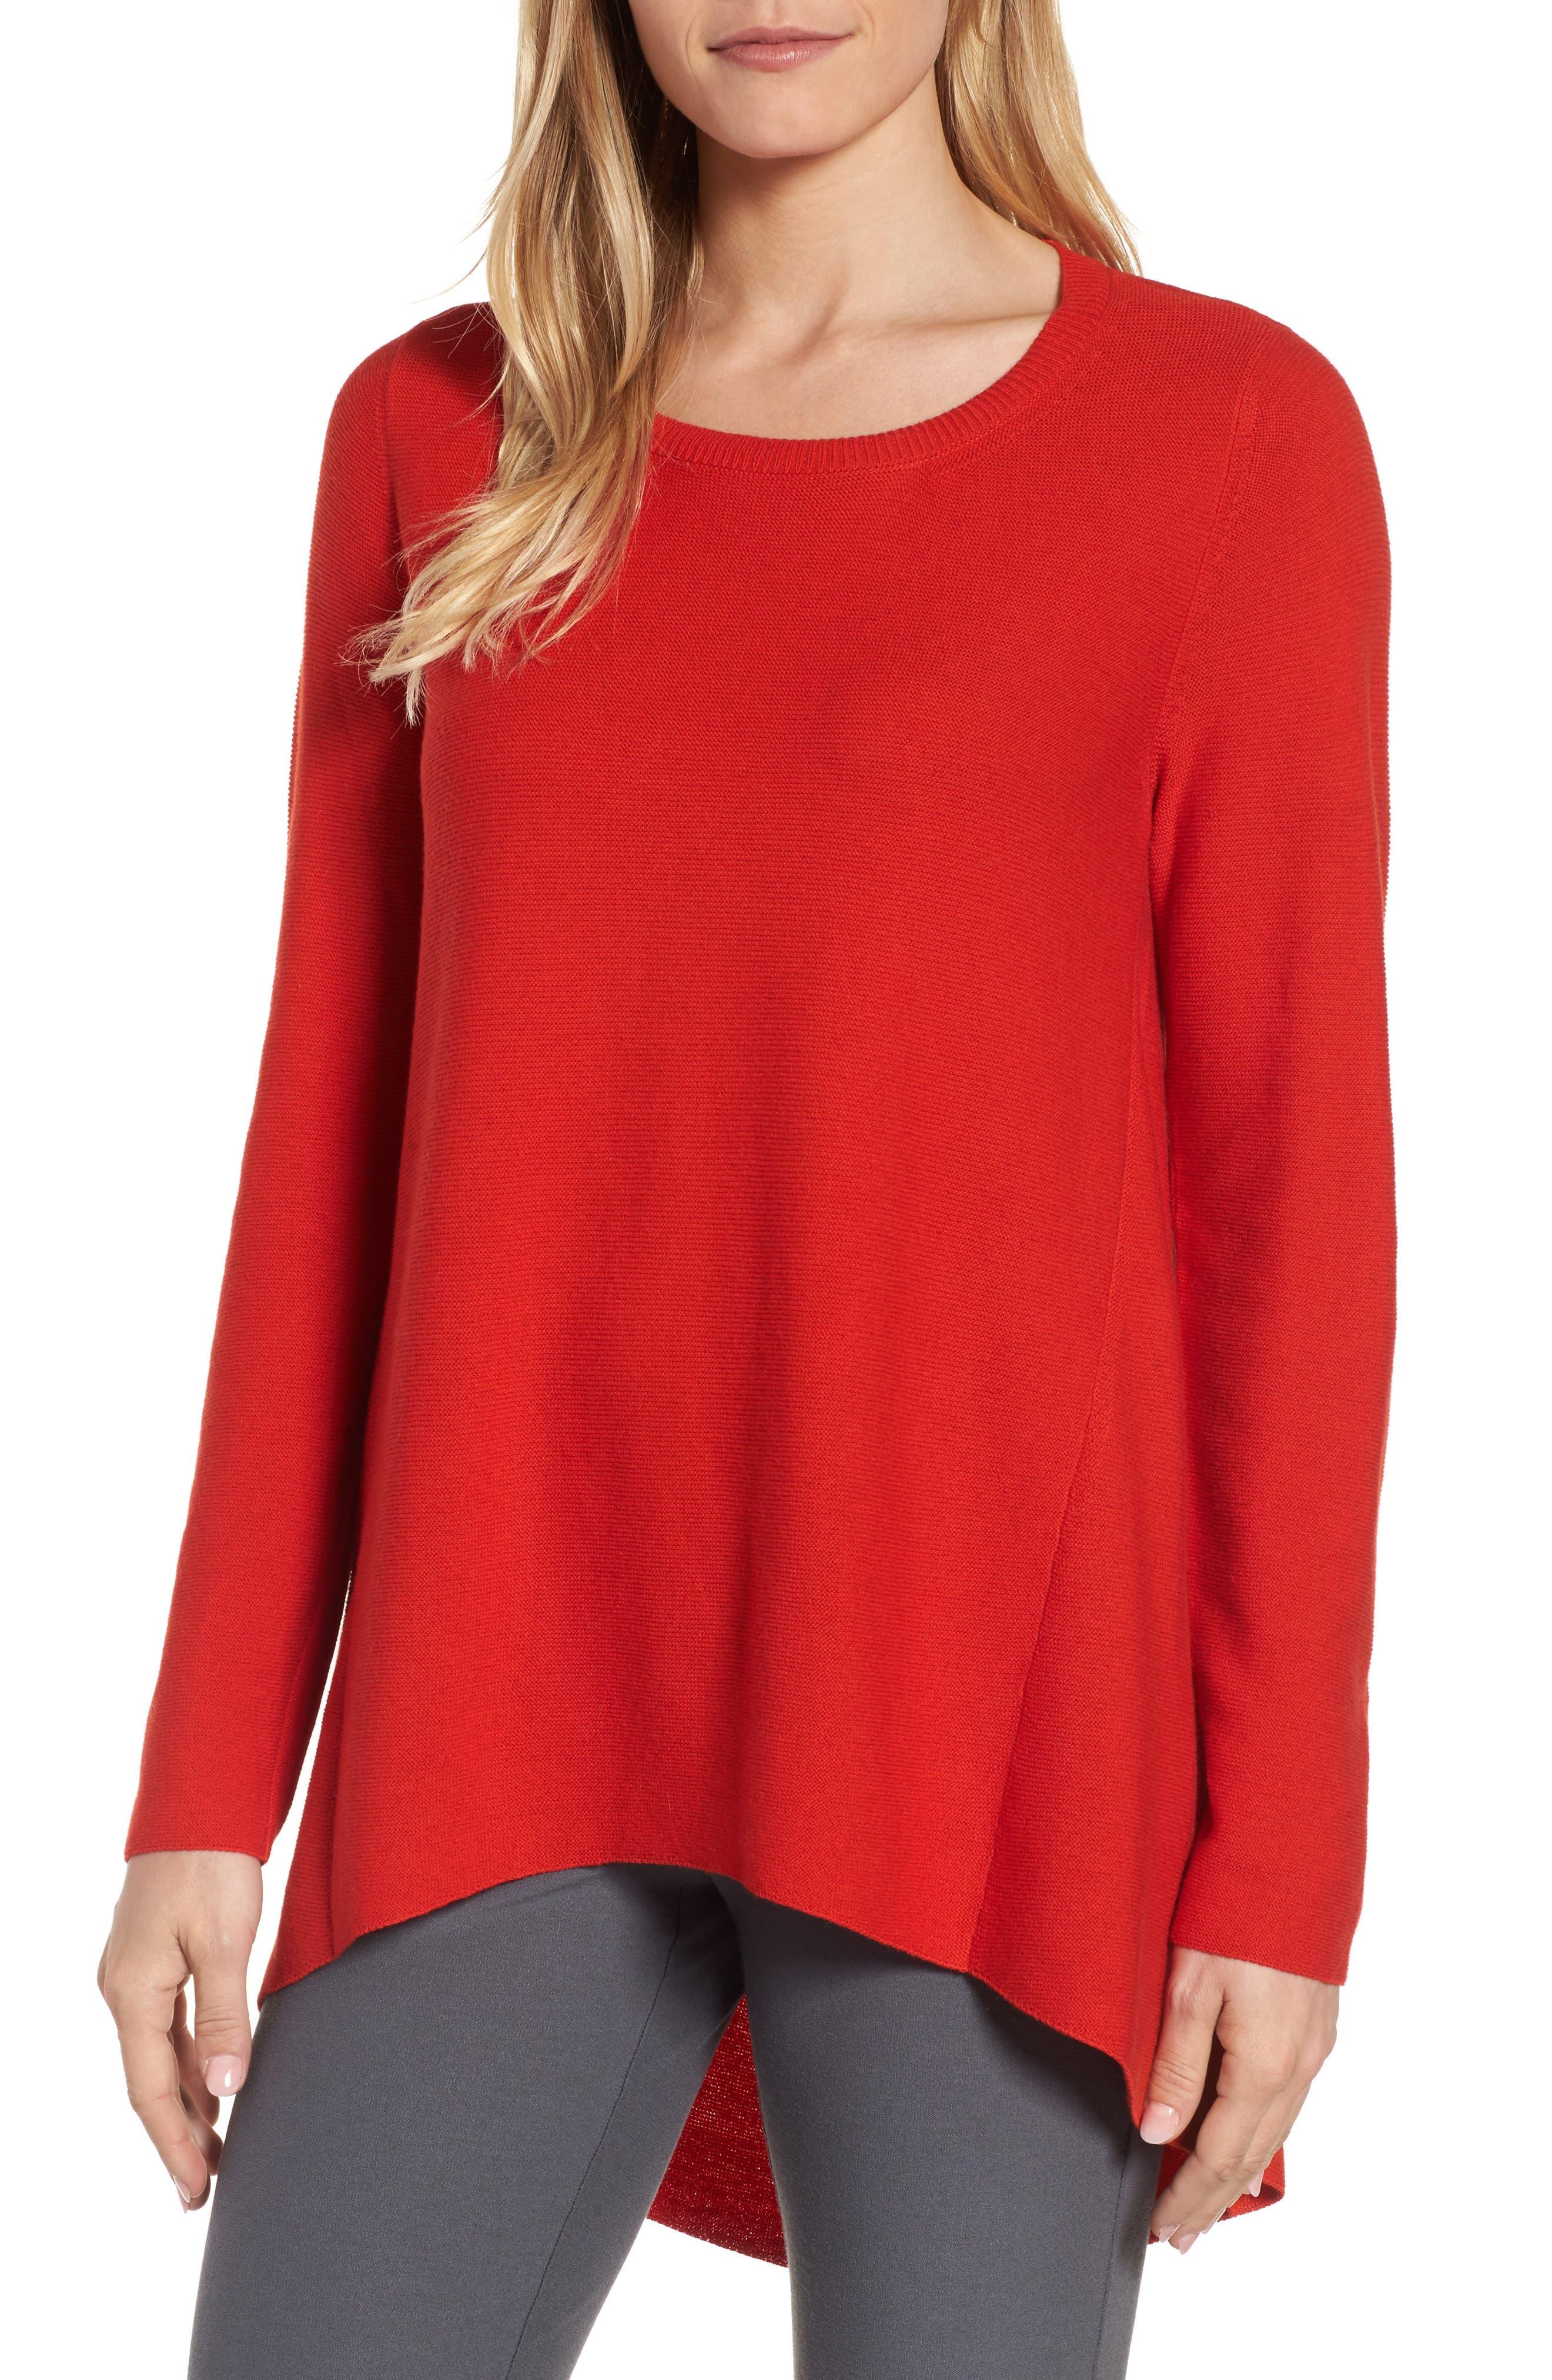 Alternate Image 1 Selected - Eileen Fisher Organic Cotton Tunic Sweater (Regular & Petite)